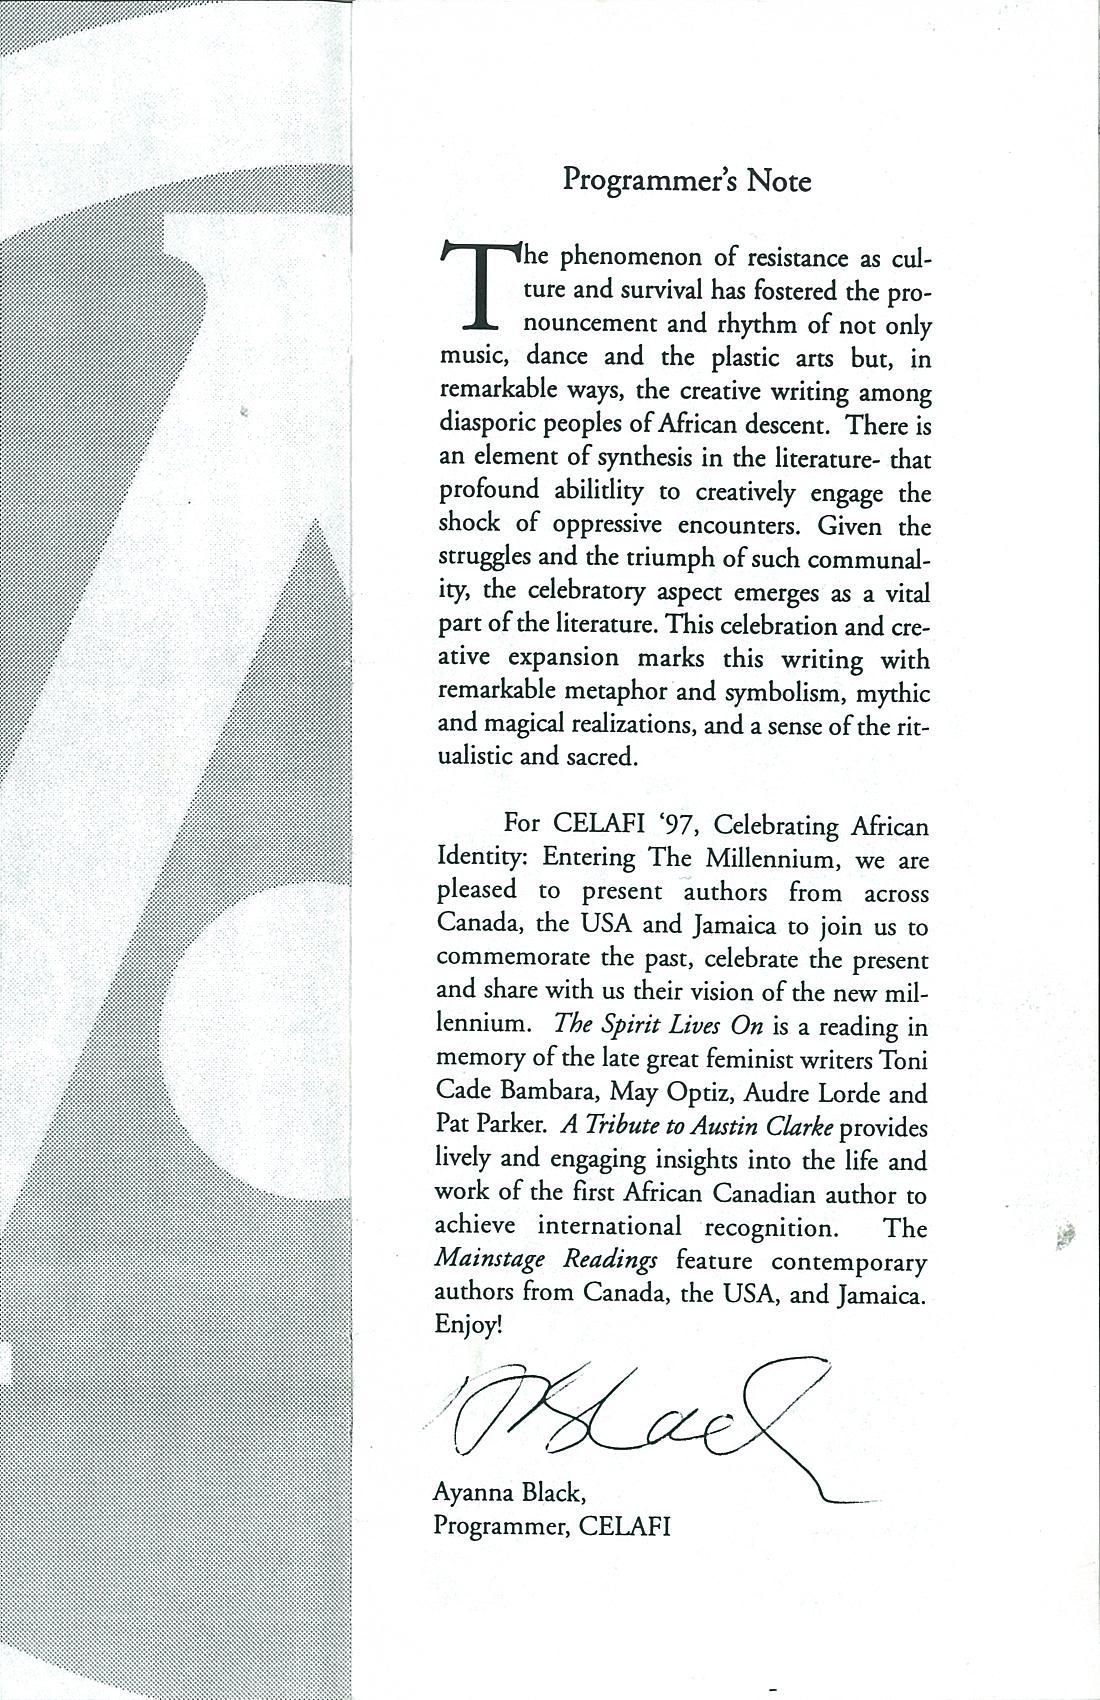 7. Lit - Austin Clarke Tribute